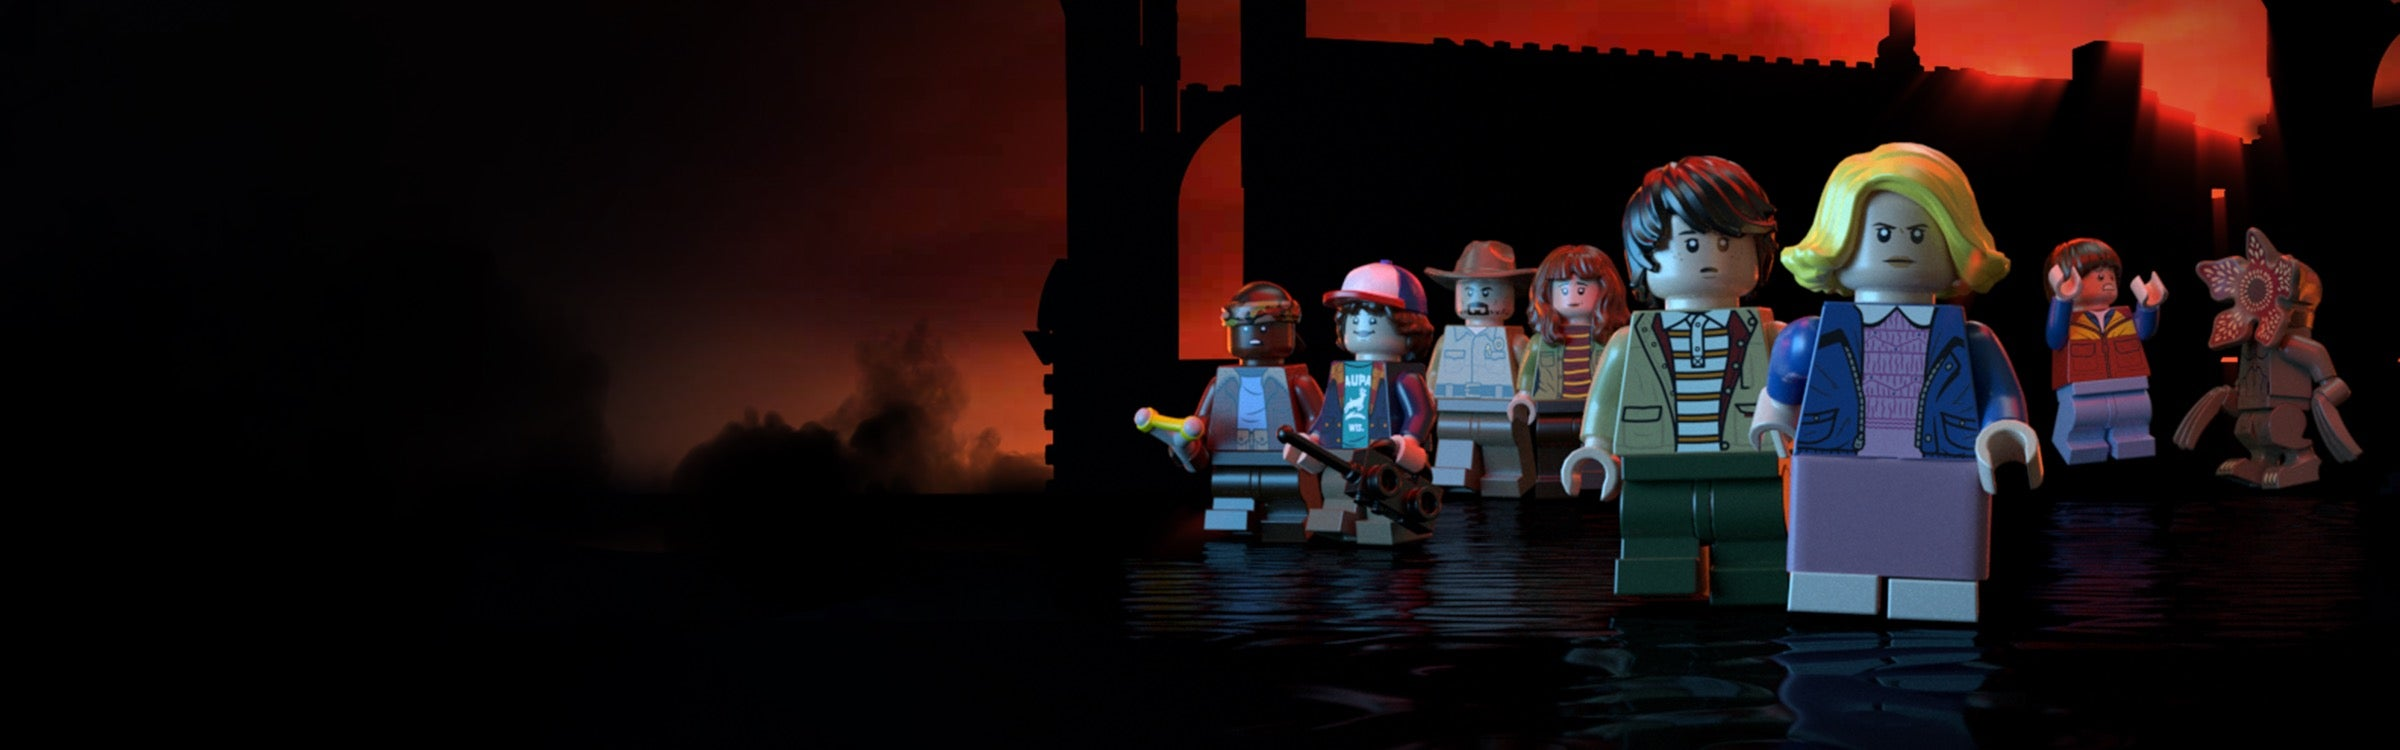 Custom LEGO Stranger Things Minifigure Lucas Sinclair